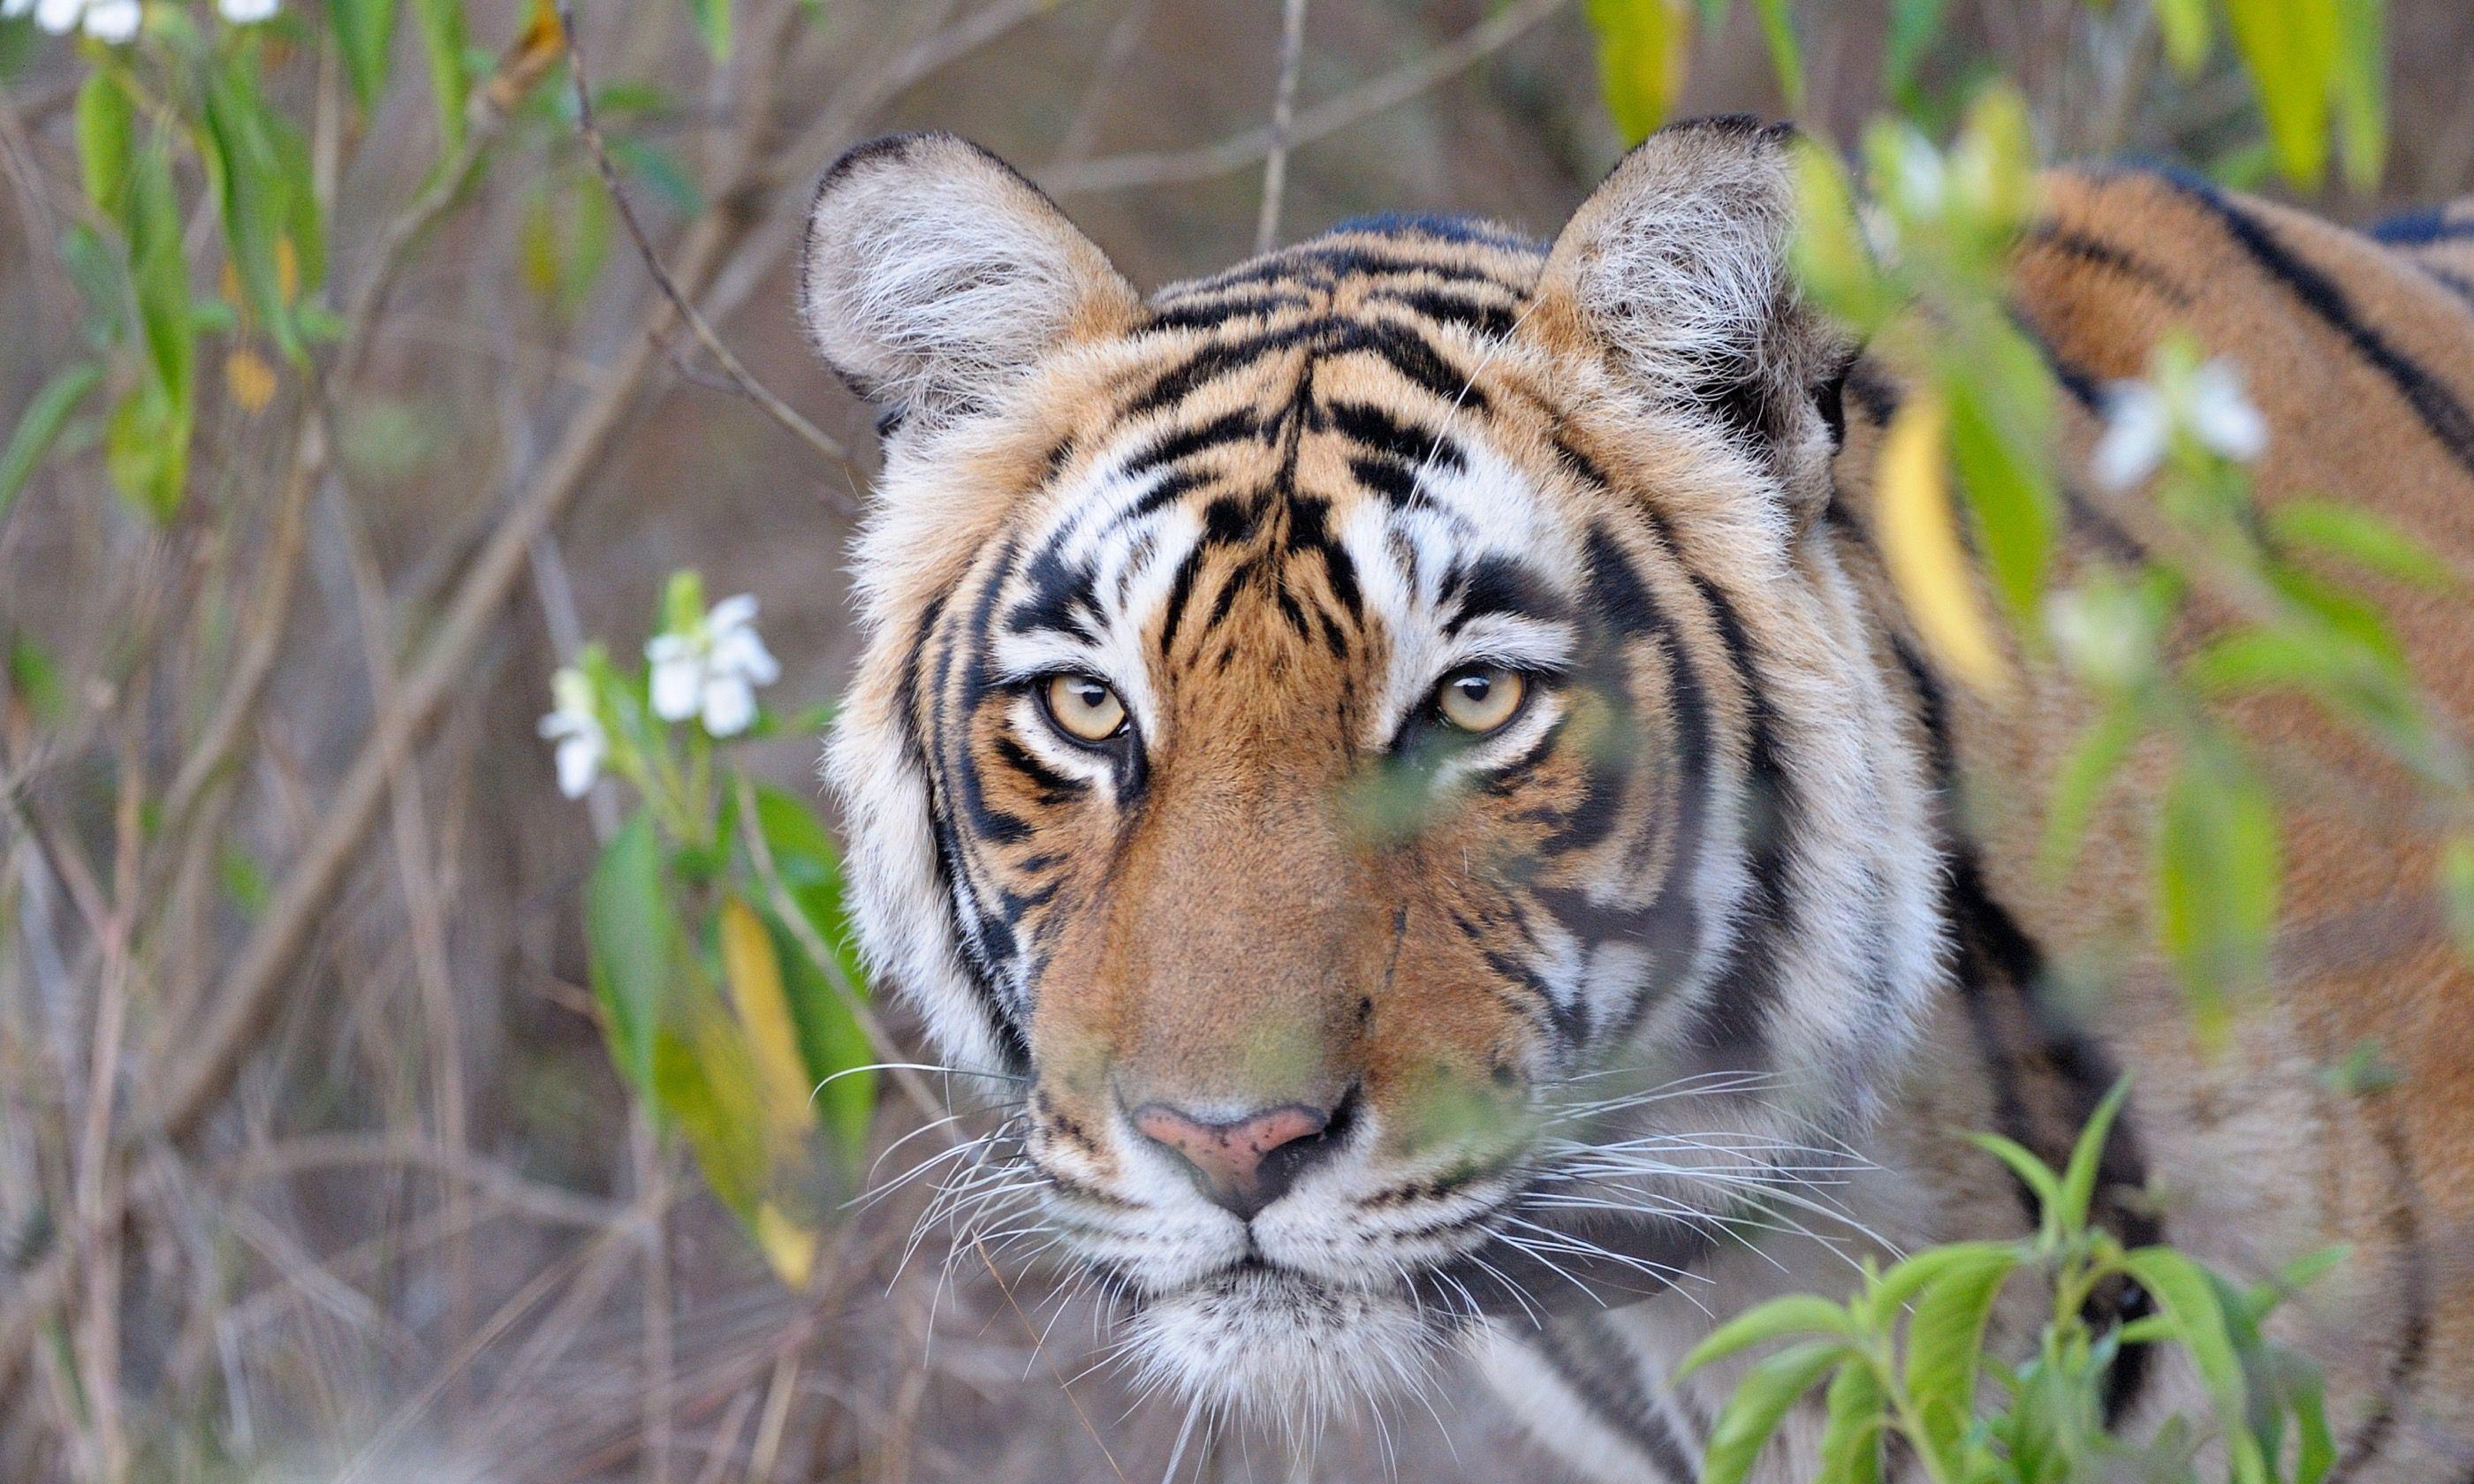 Tiger in Ranthambhore National Park (Dreamstime)